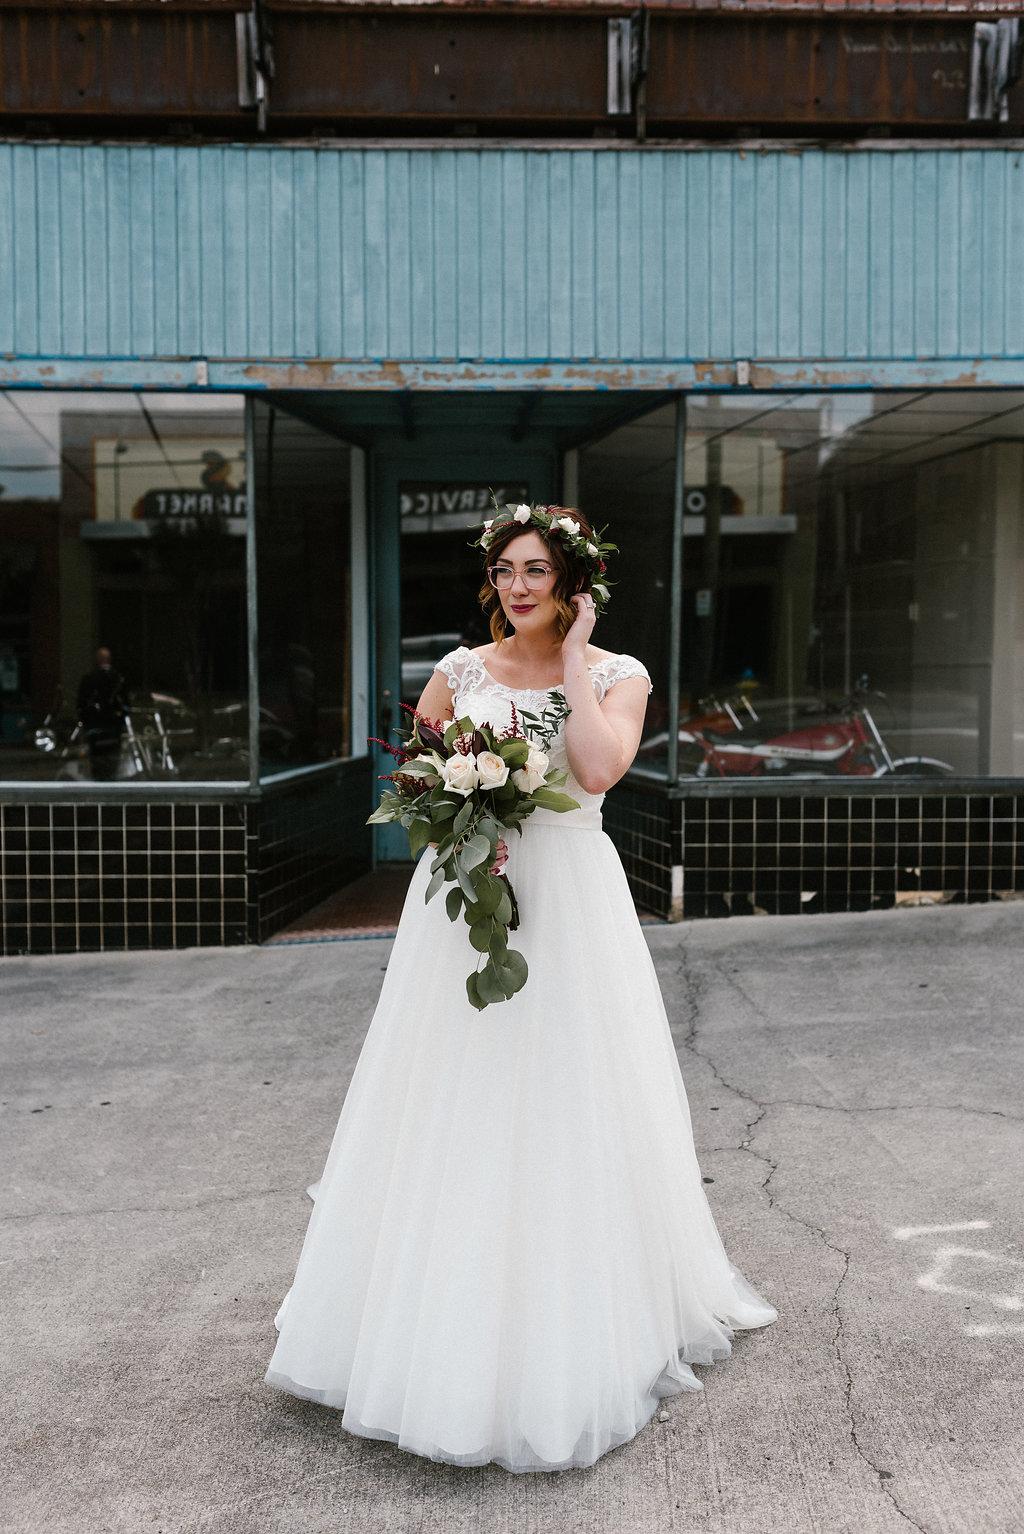 Standard Downtown Knoxville Wedding Venue Bridal Portrait Urban Central Avenue